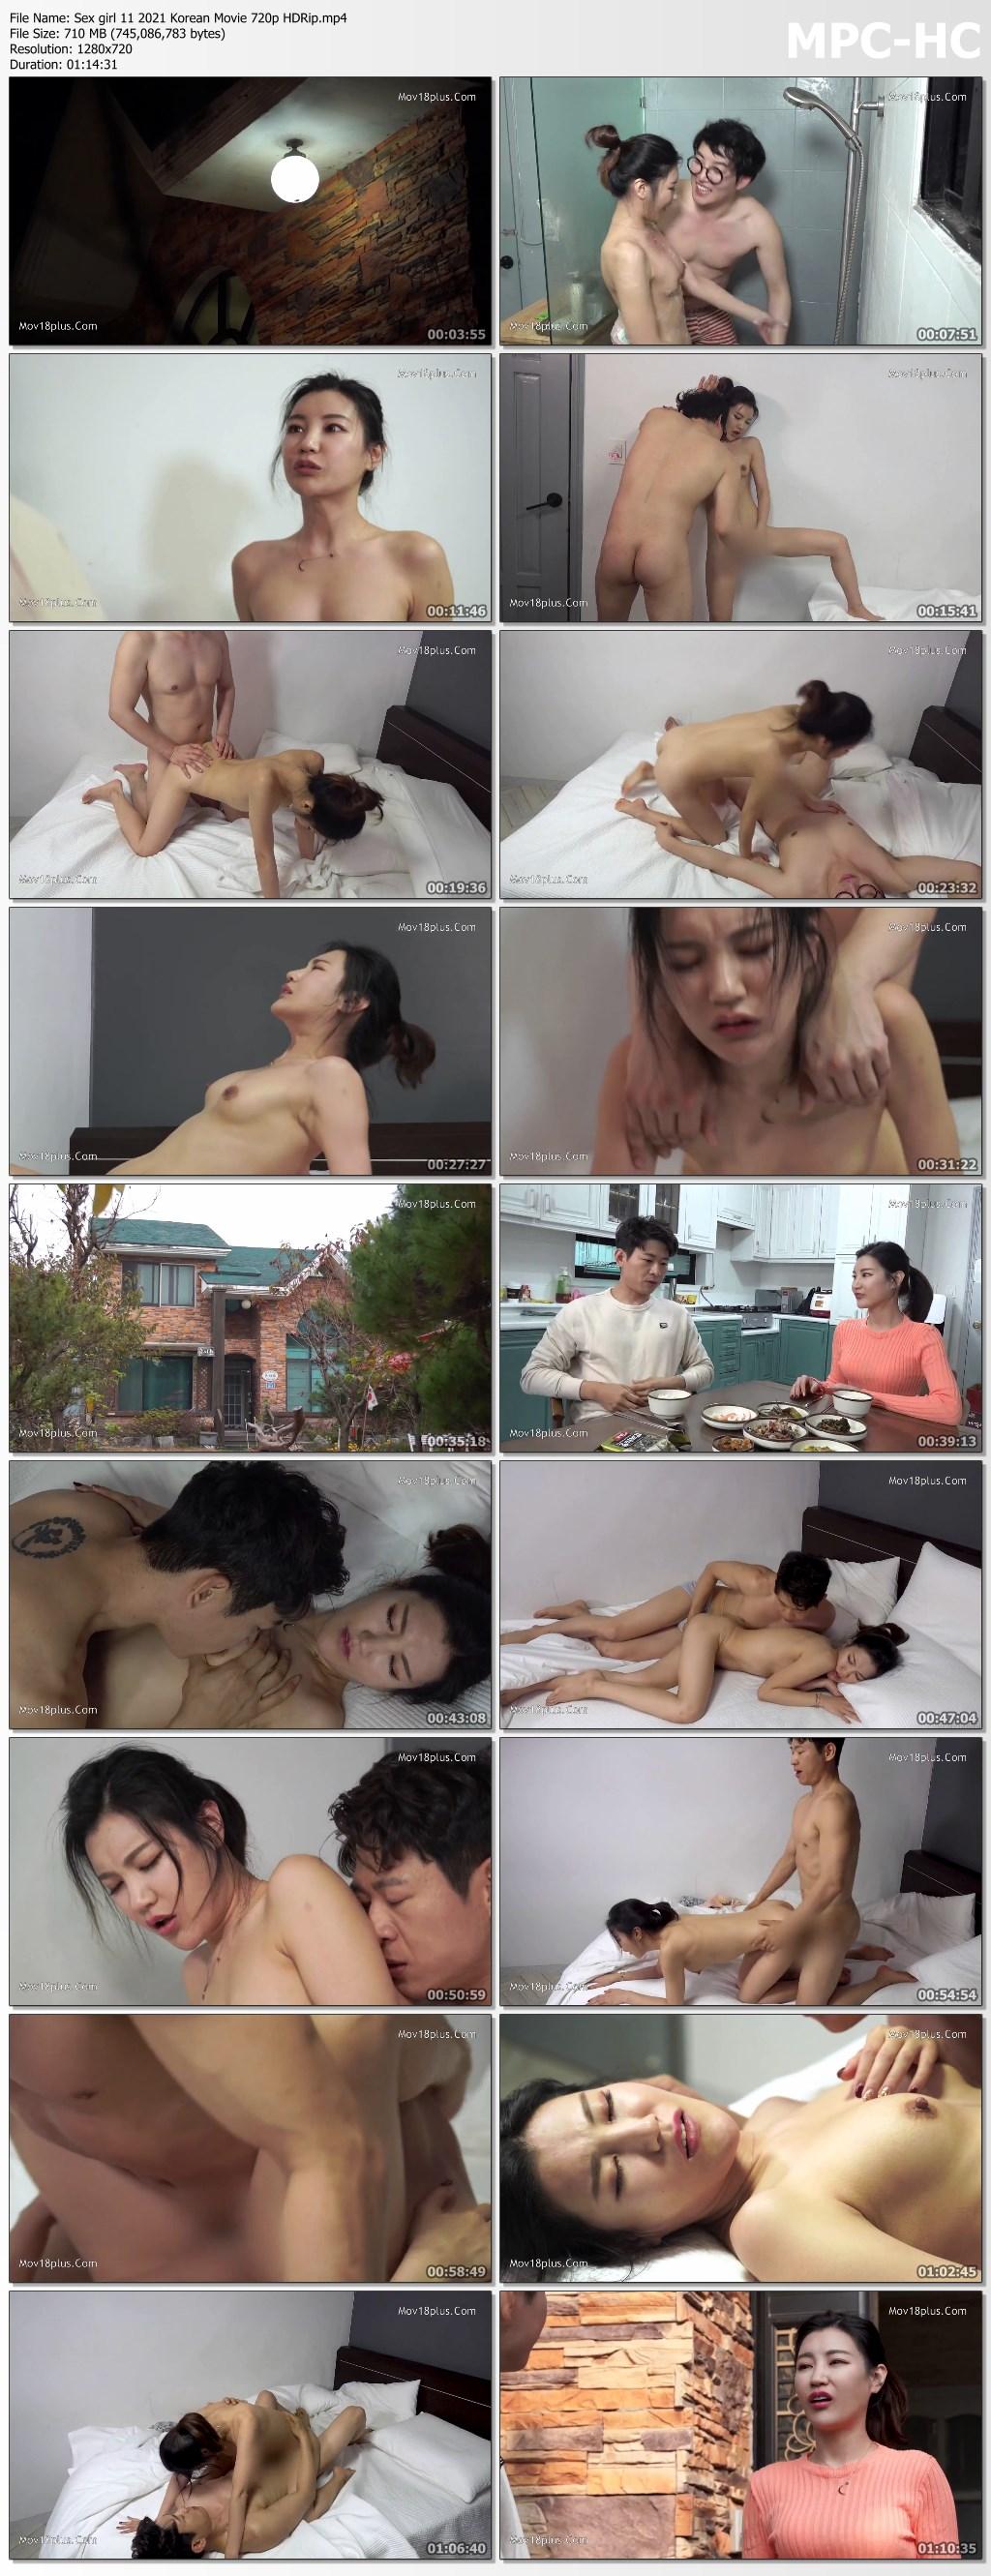 Sex girl 11 2021 Korean Movie 720p HDRip.mp4 thumbs